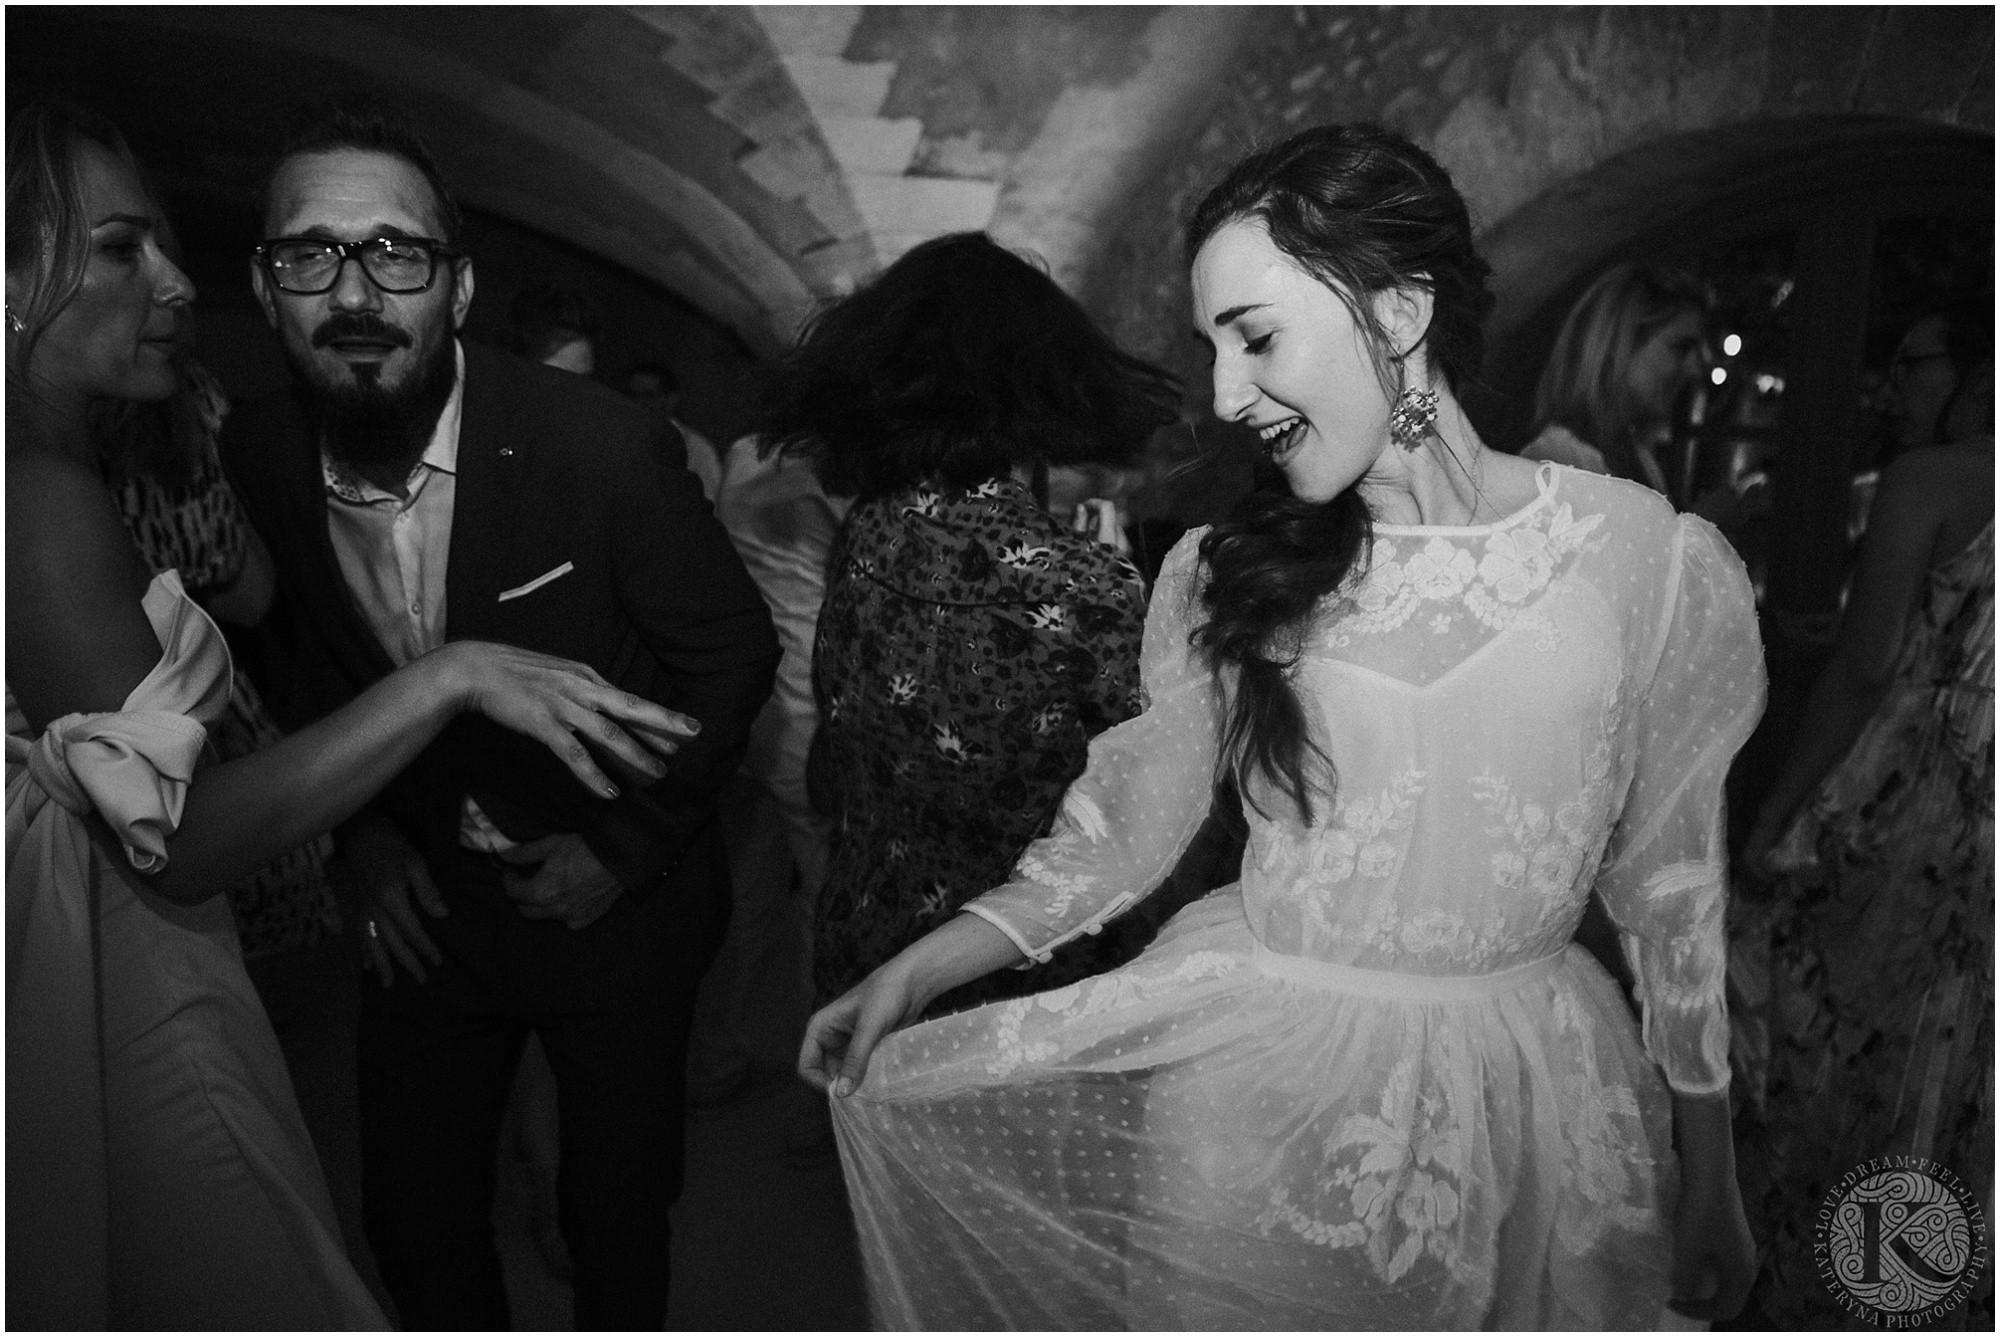 Kateryna-photos-photographe-mariage-vaucluse-provence-avignon-ferme-st-hugues_0099.jpg